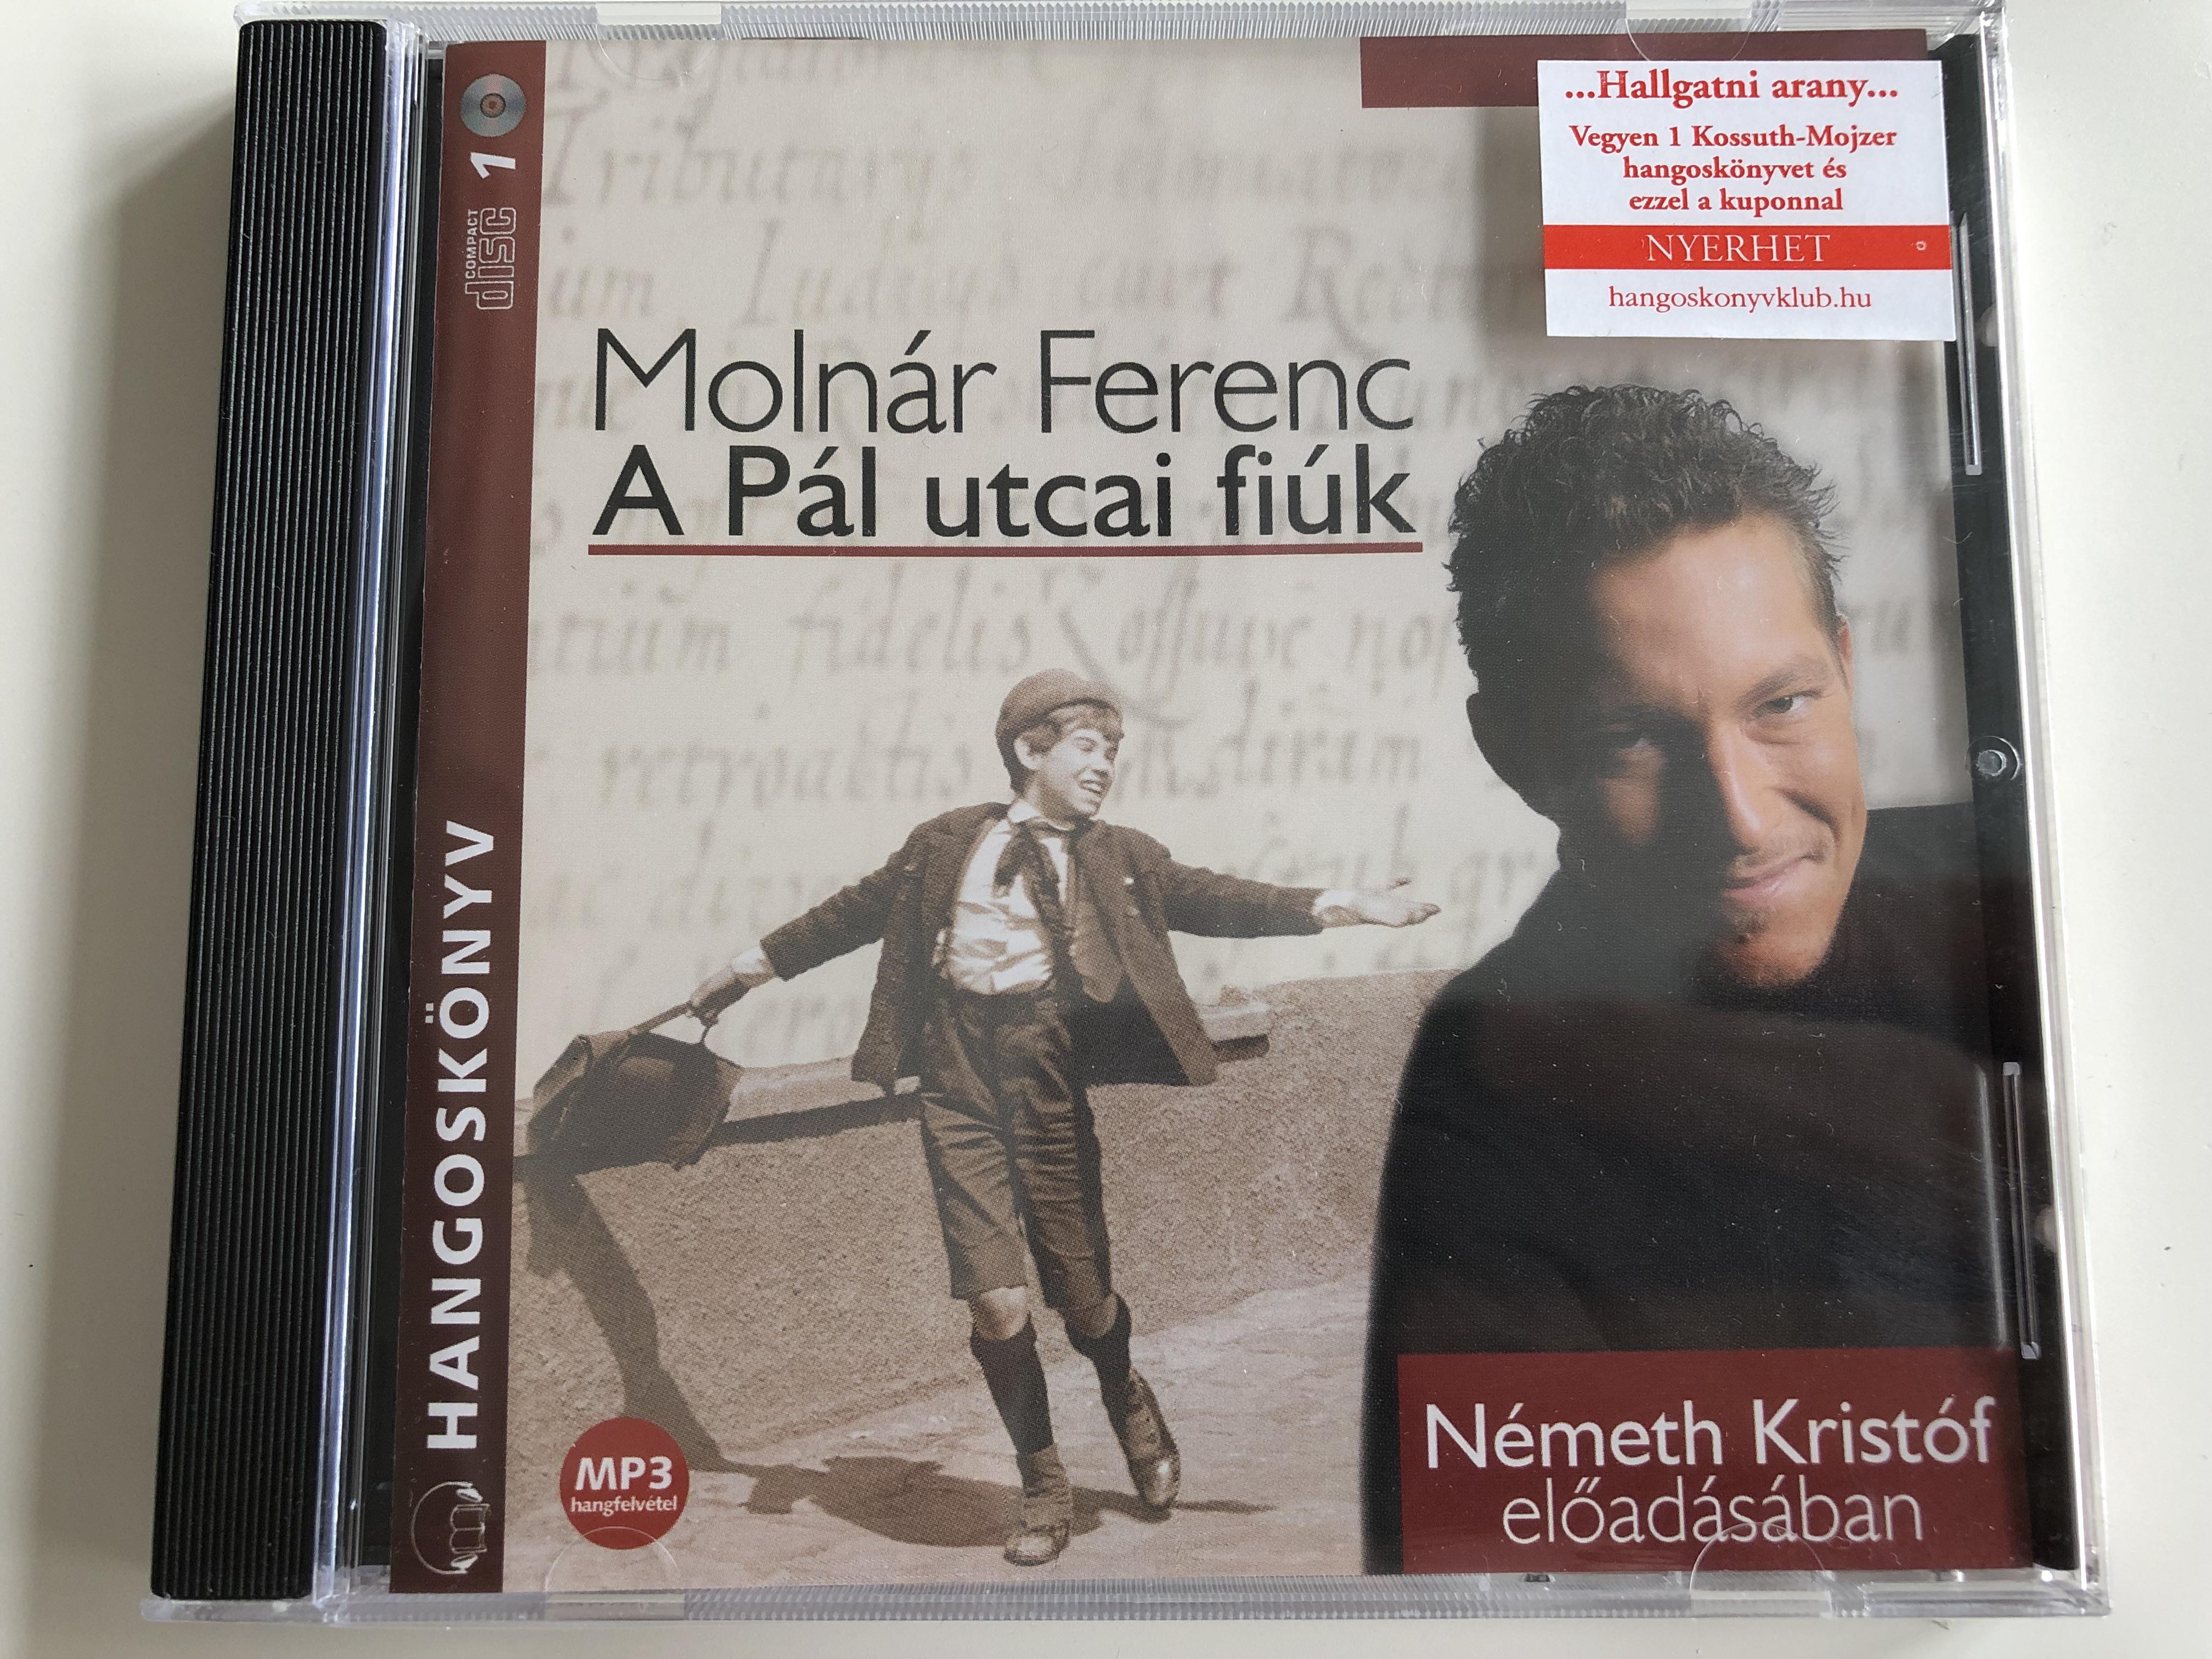 a-p-l-utcai-fi-k-by-moln-r-ferenc-mp3-audio-book-the-paul-street-boys-read-by-n-meth-krist-f-audio-cd-kossuth-mojzer-kiad-1-.jpg